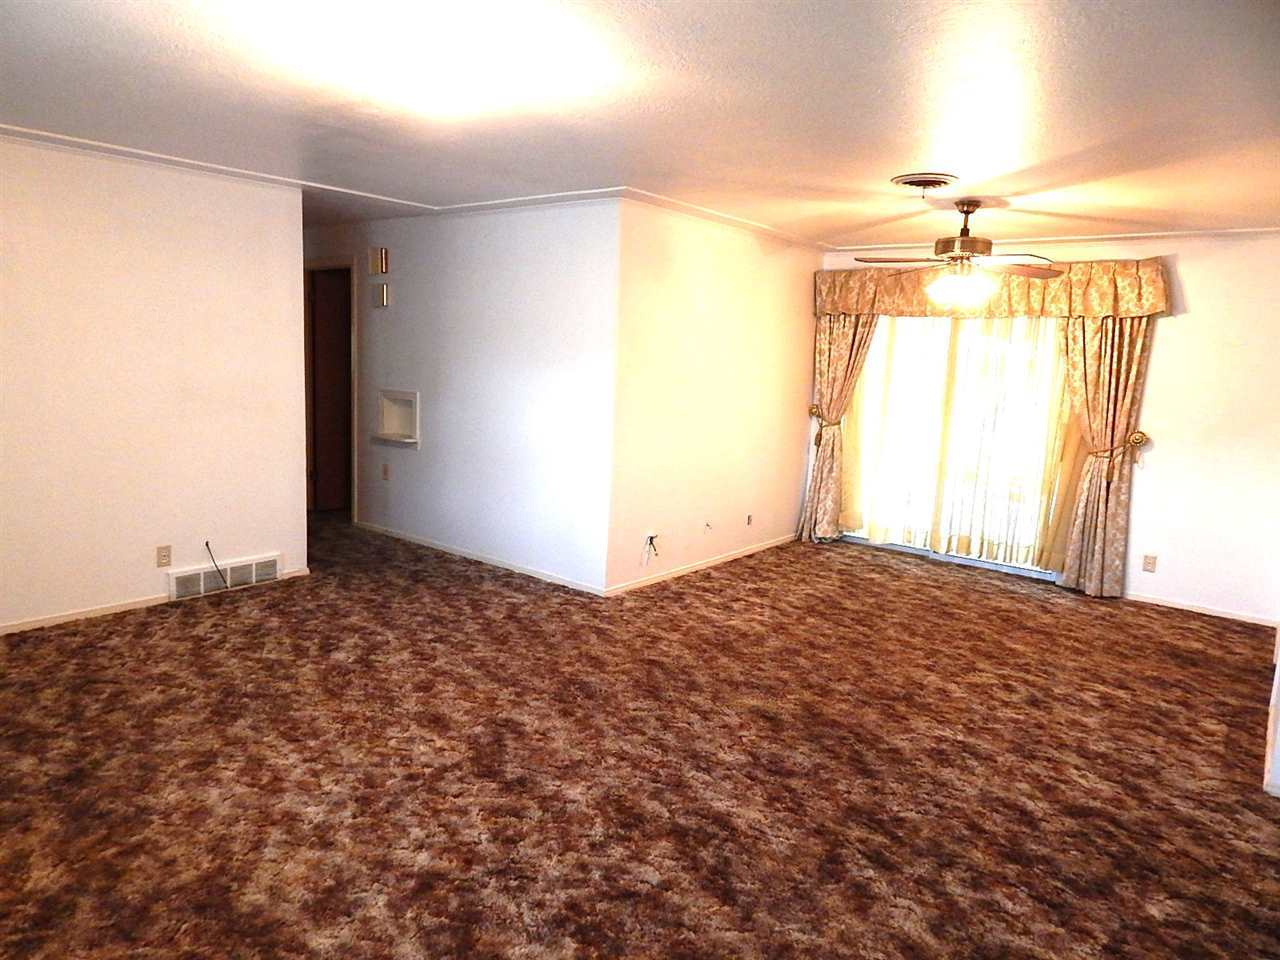 Sold Cross Sale W/ MLS | 720 N 14th Ponca City, OK 74601 2